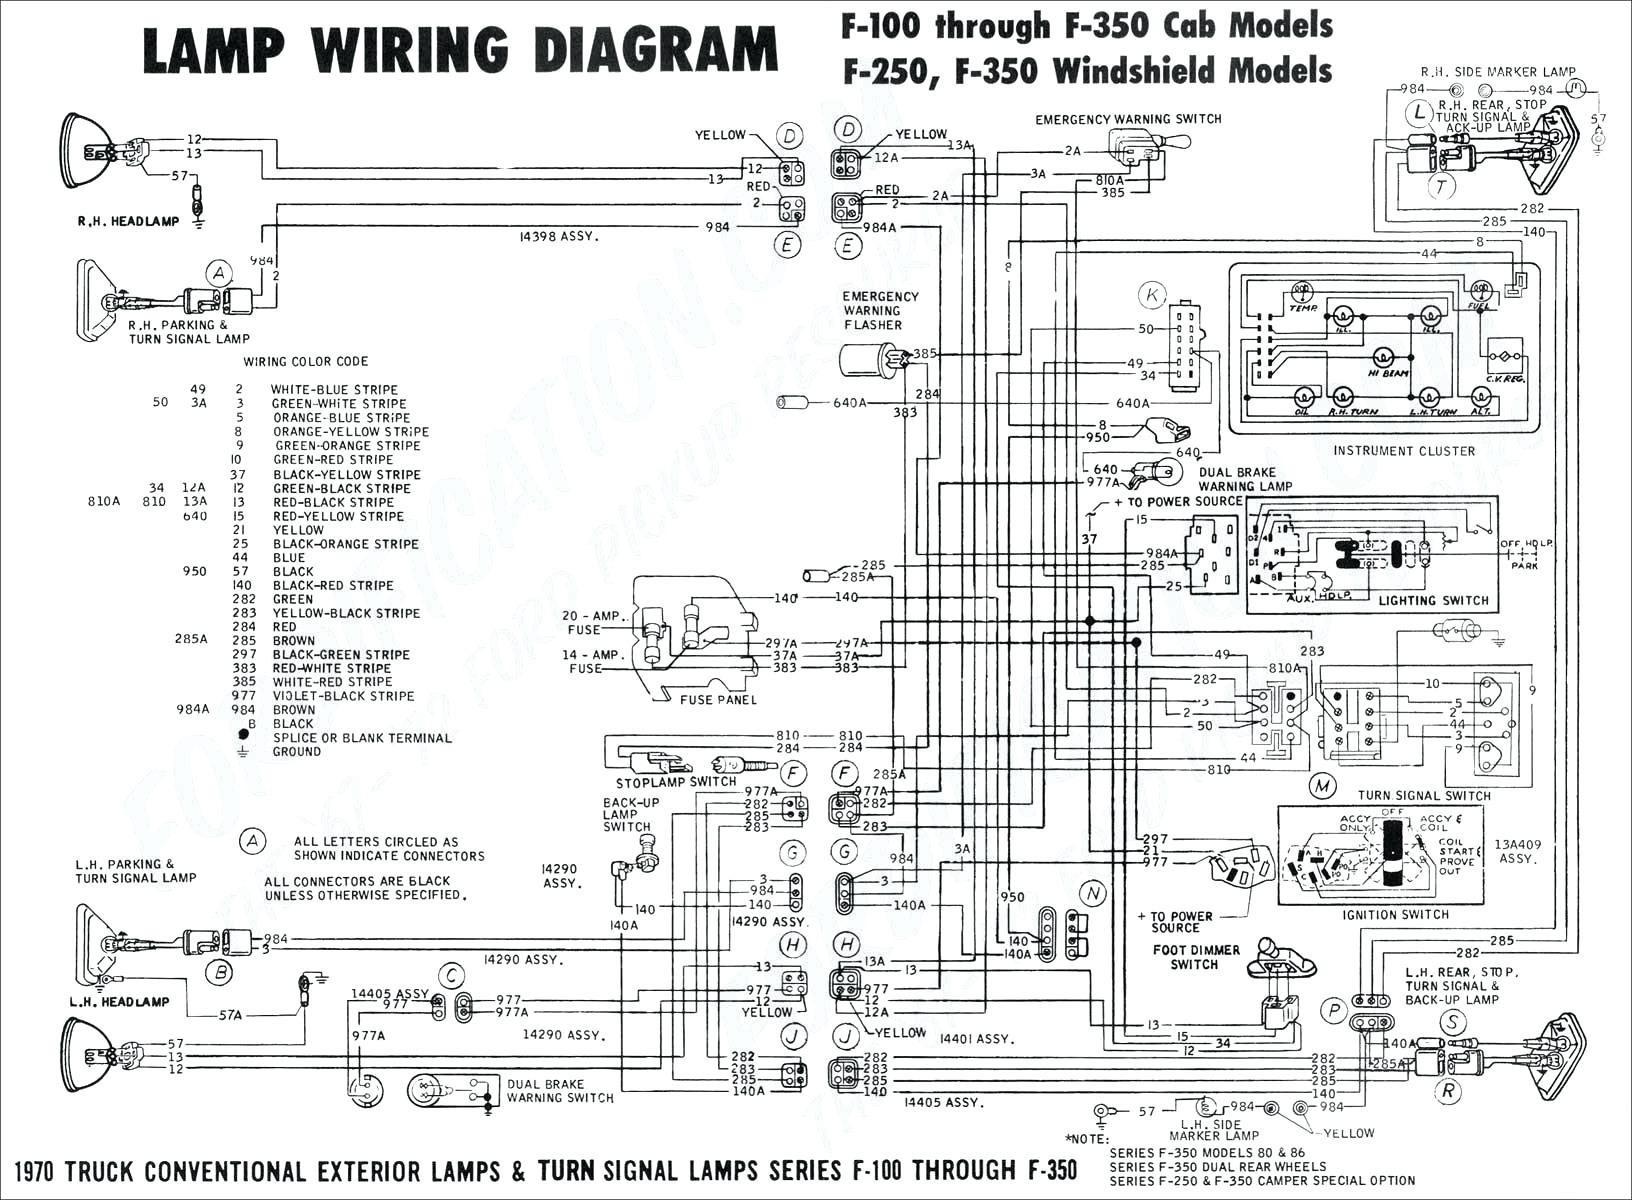 Bad Boy Buggies Wire Diagram 2005 Durango Stereo Wiring Diagram Of Bad Boy Buggies Wire Diagram